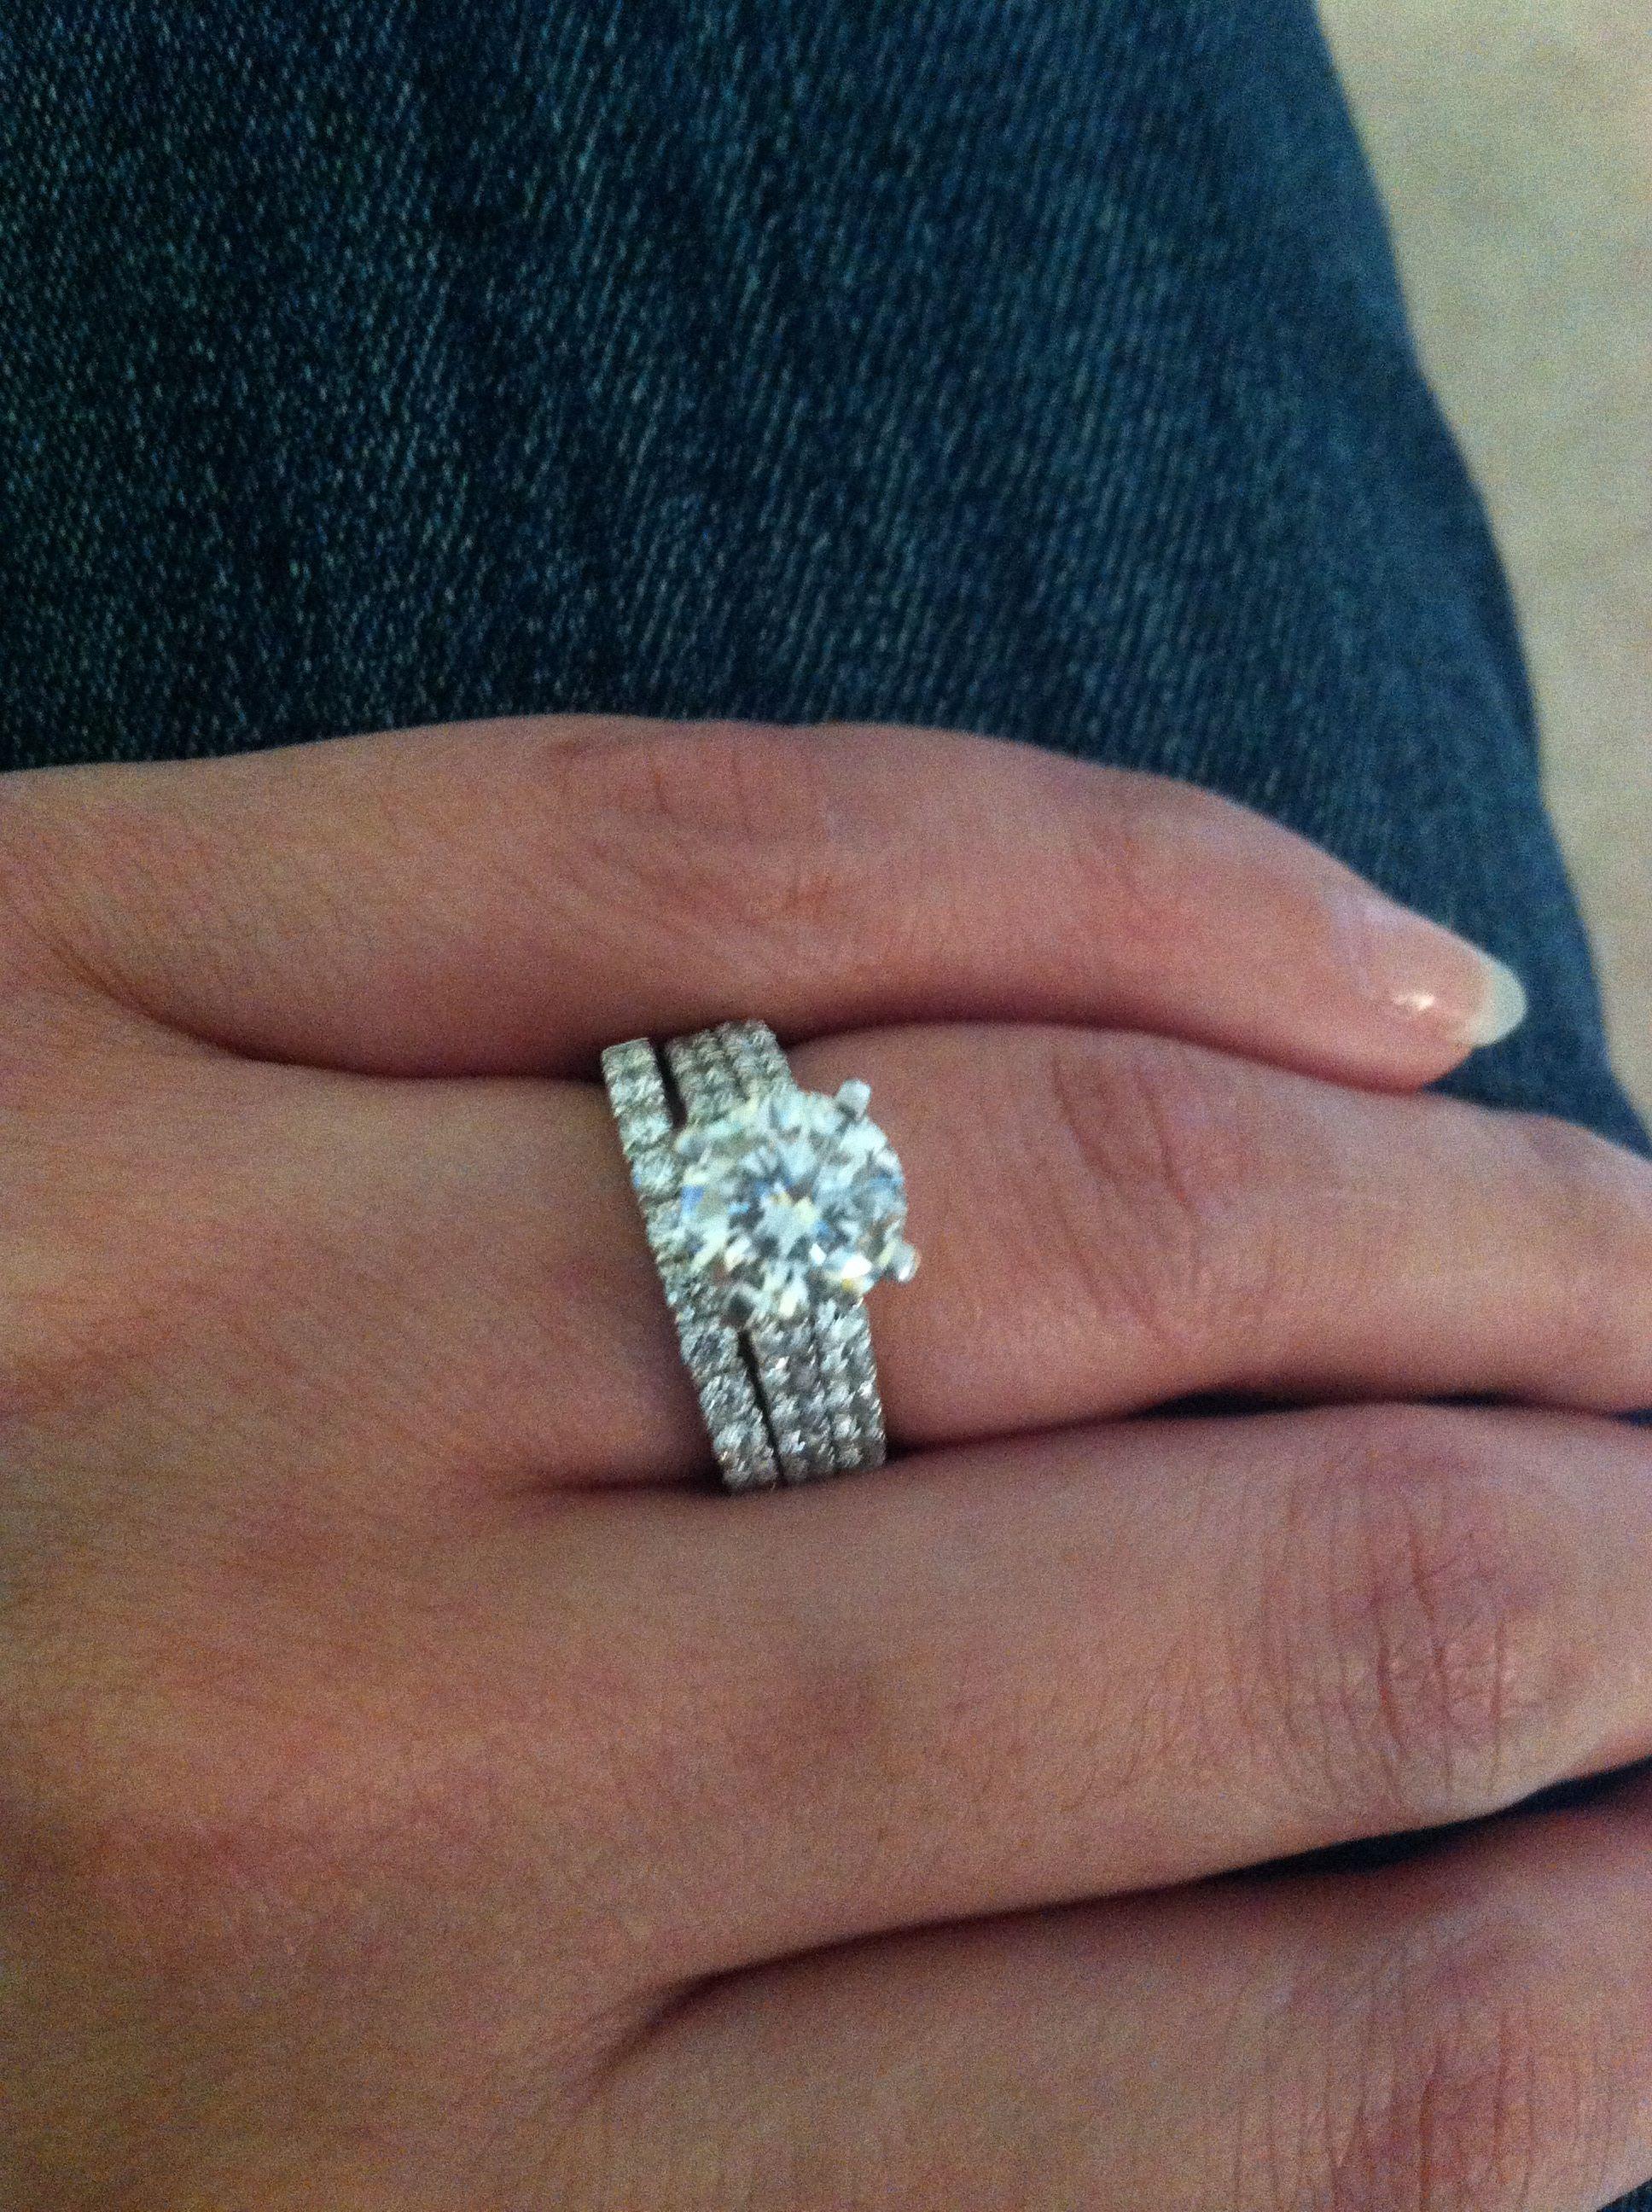 zales diamond wedding rings 2 5 ctw 1 5 ct center round diamond engagement bridalset weddingband